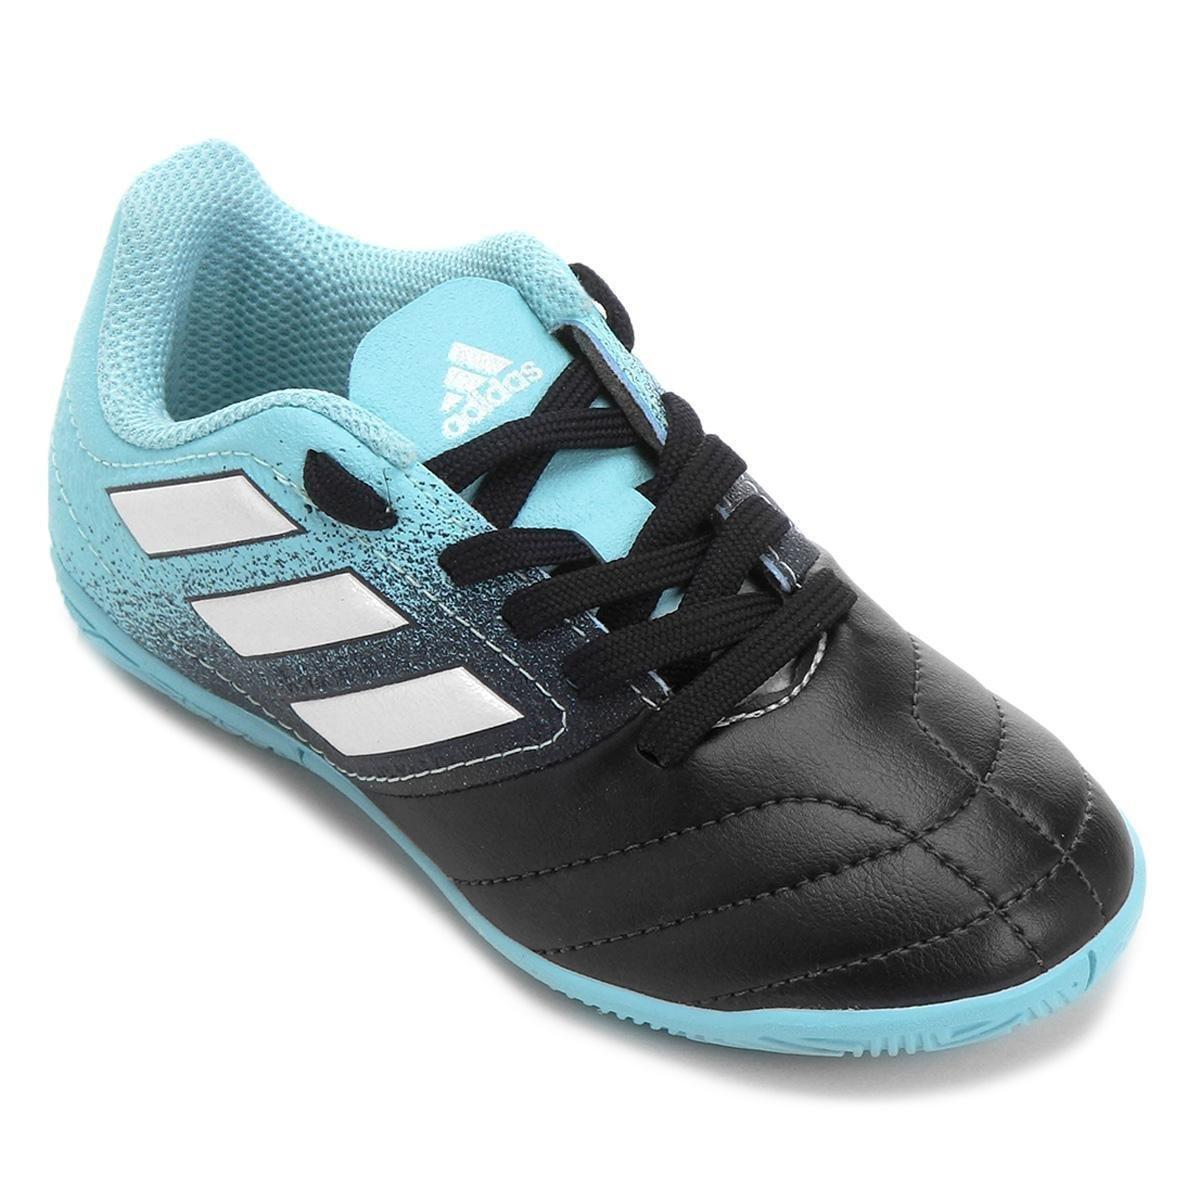 7322b6874 Chuteira Futsal Infantil Adidas Ace 17.4 IN - Compre Agora